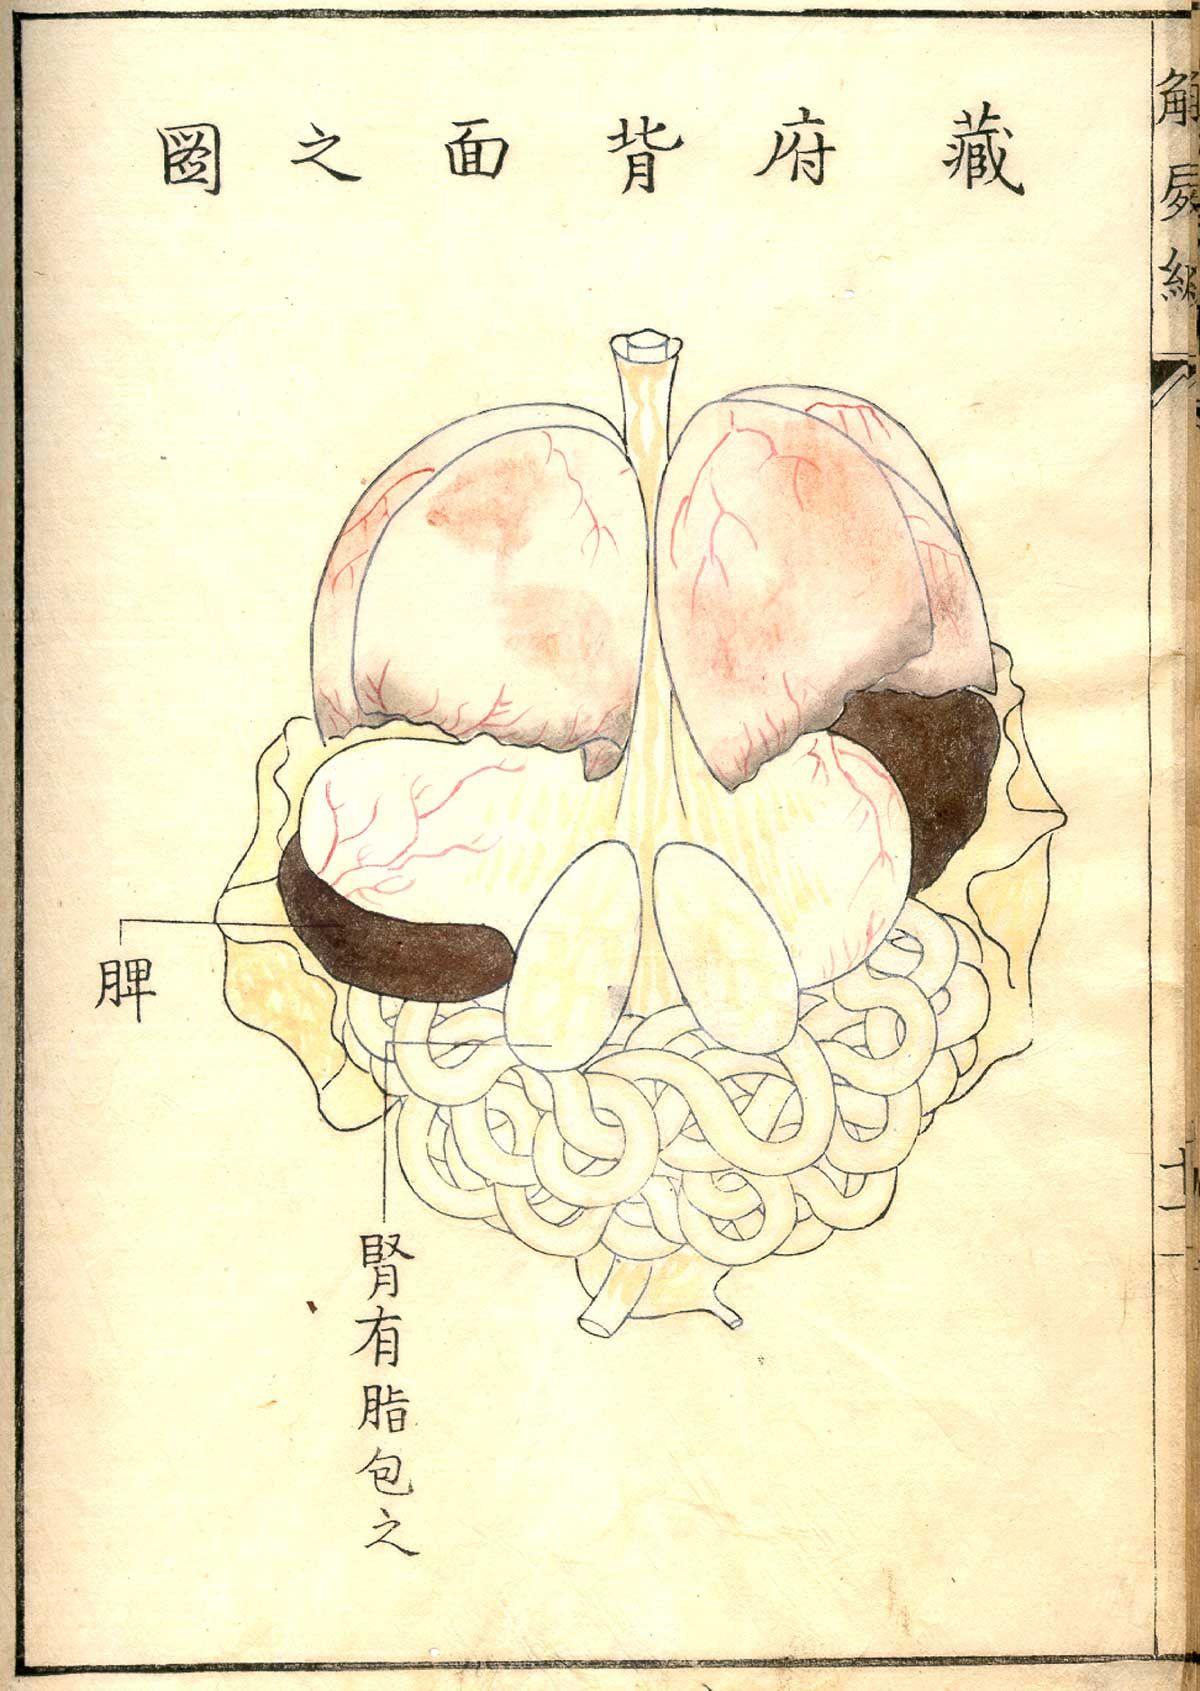 kawaguchi_p11r.jpg 1,200×1,691 pixels | limbo | Pinterest | Anatomy ...